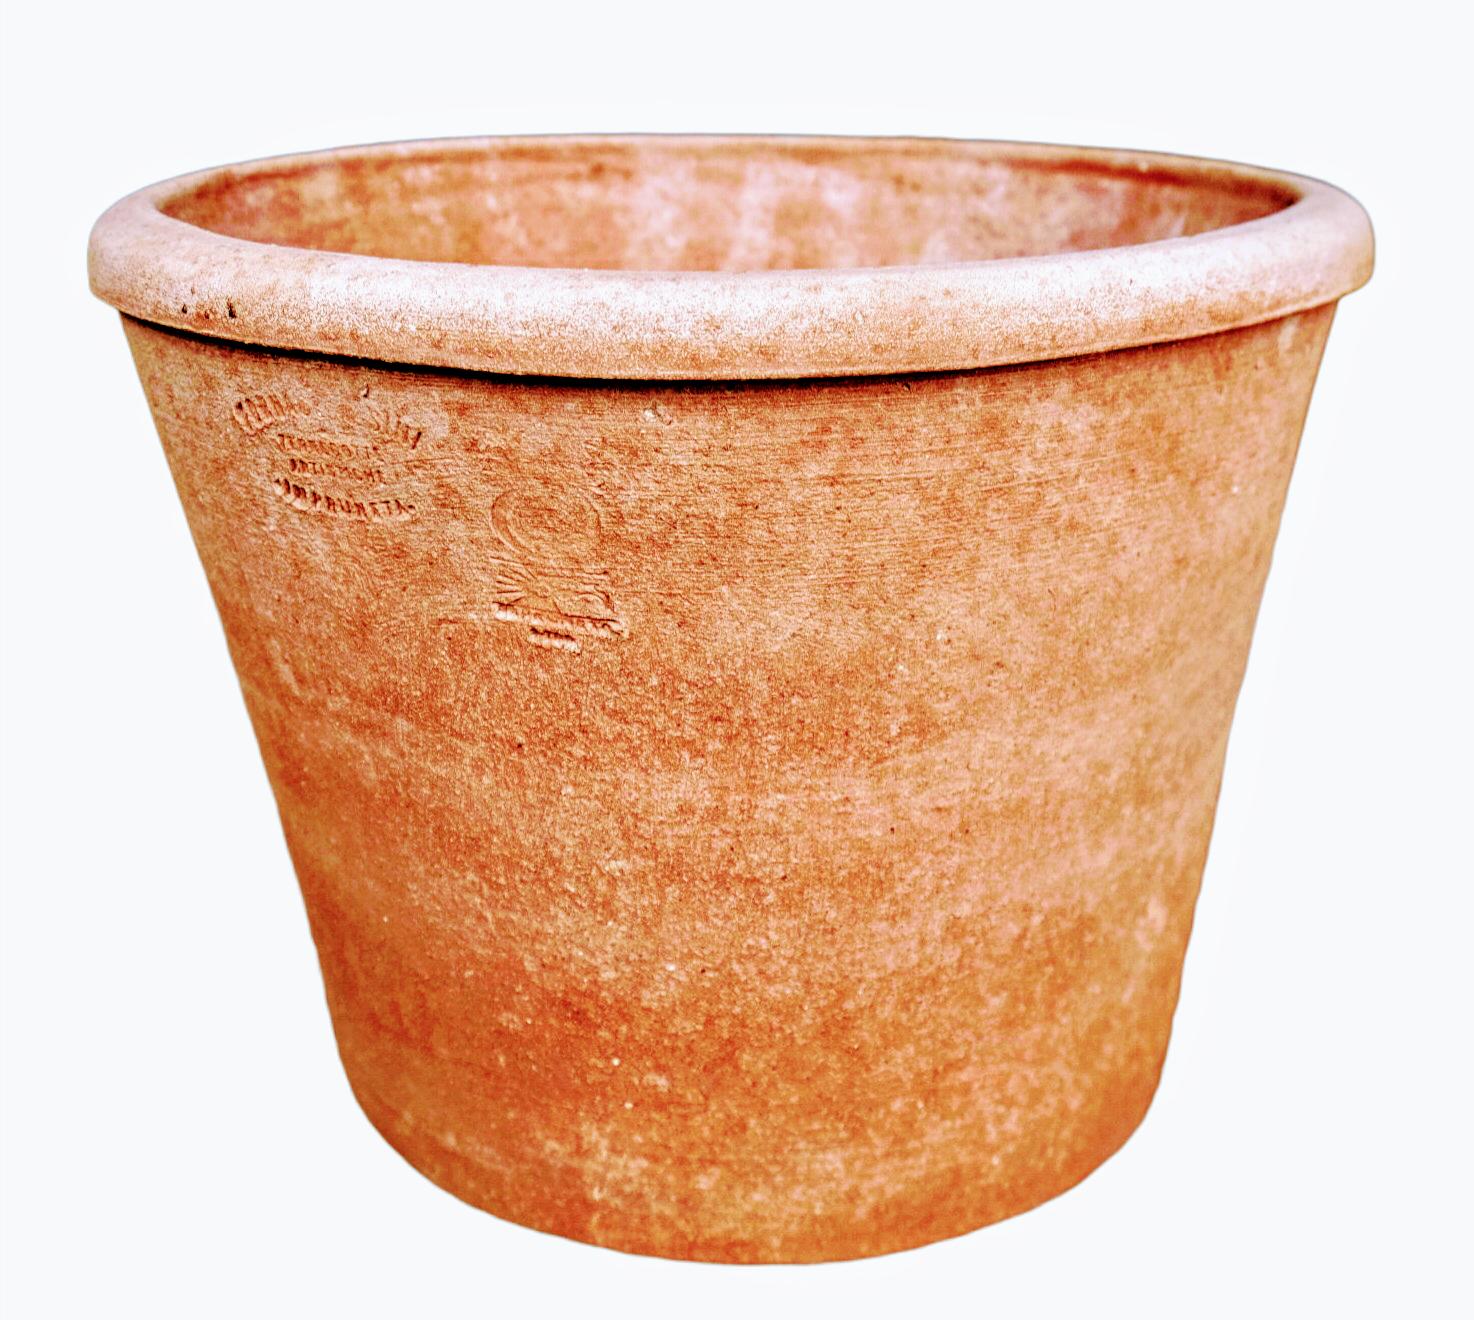 Vaso AG - Schlichter Terracottatopf